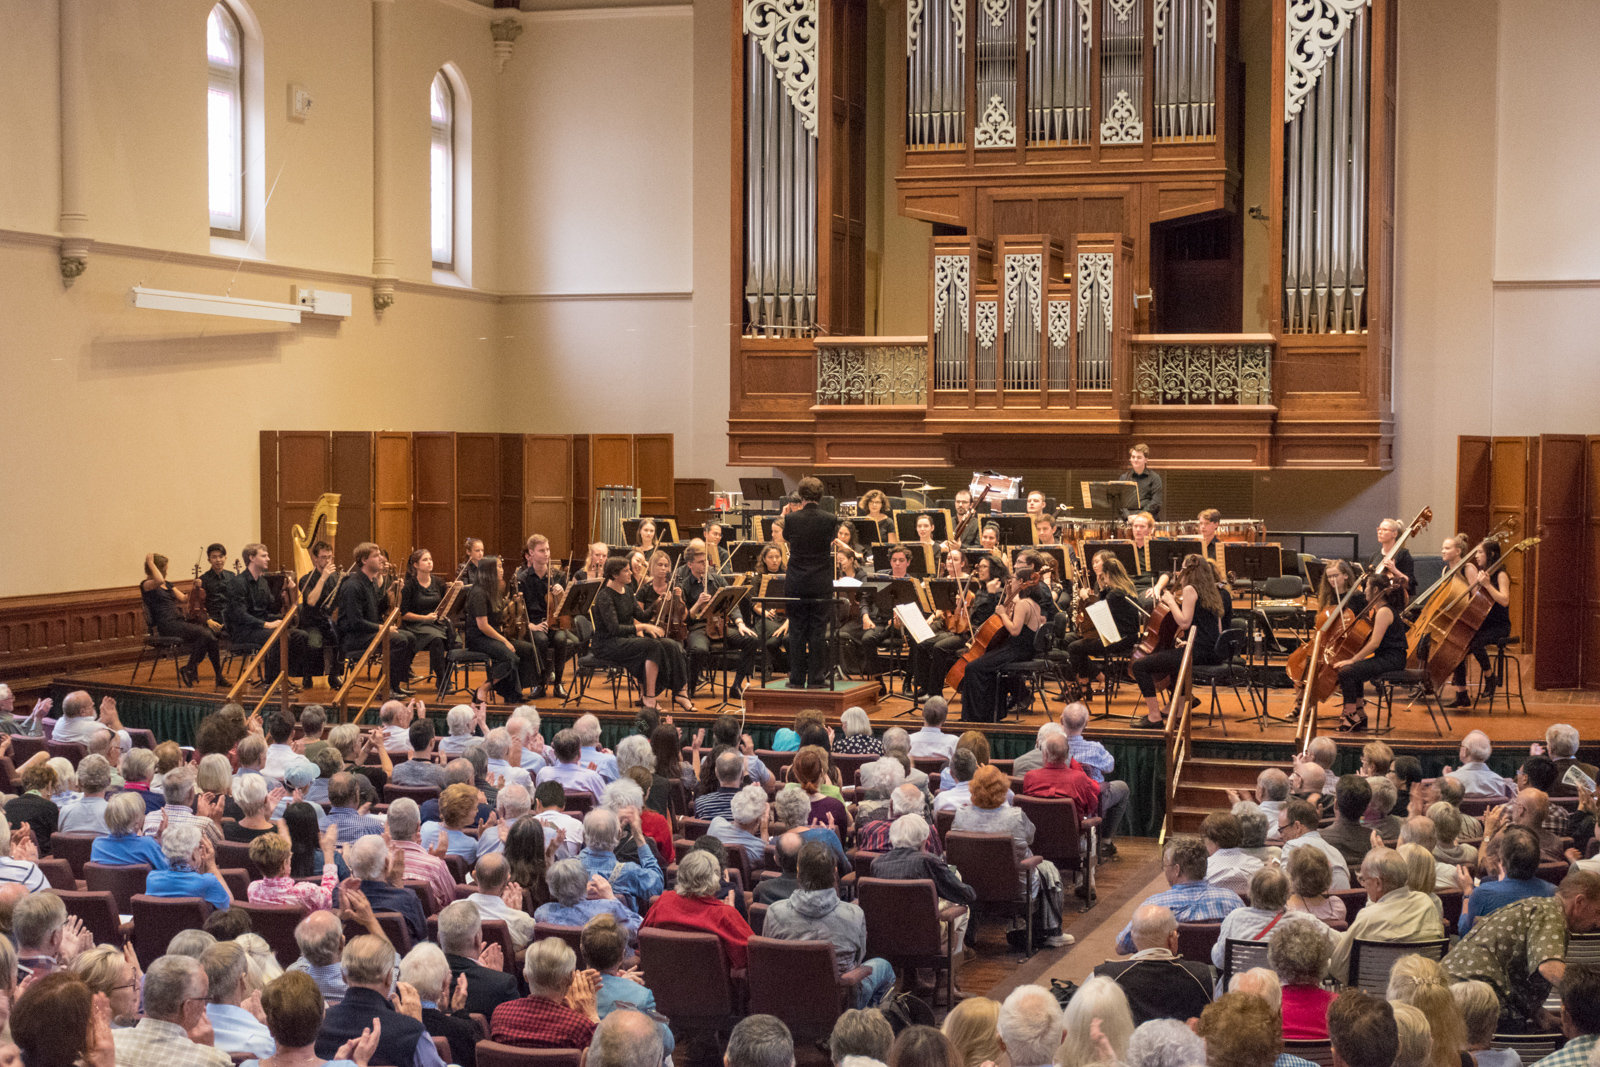 Elder Conservatorium Symphony Orchestra